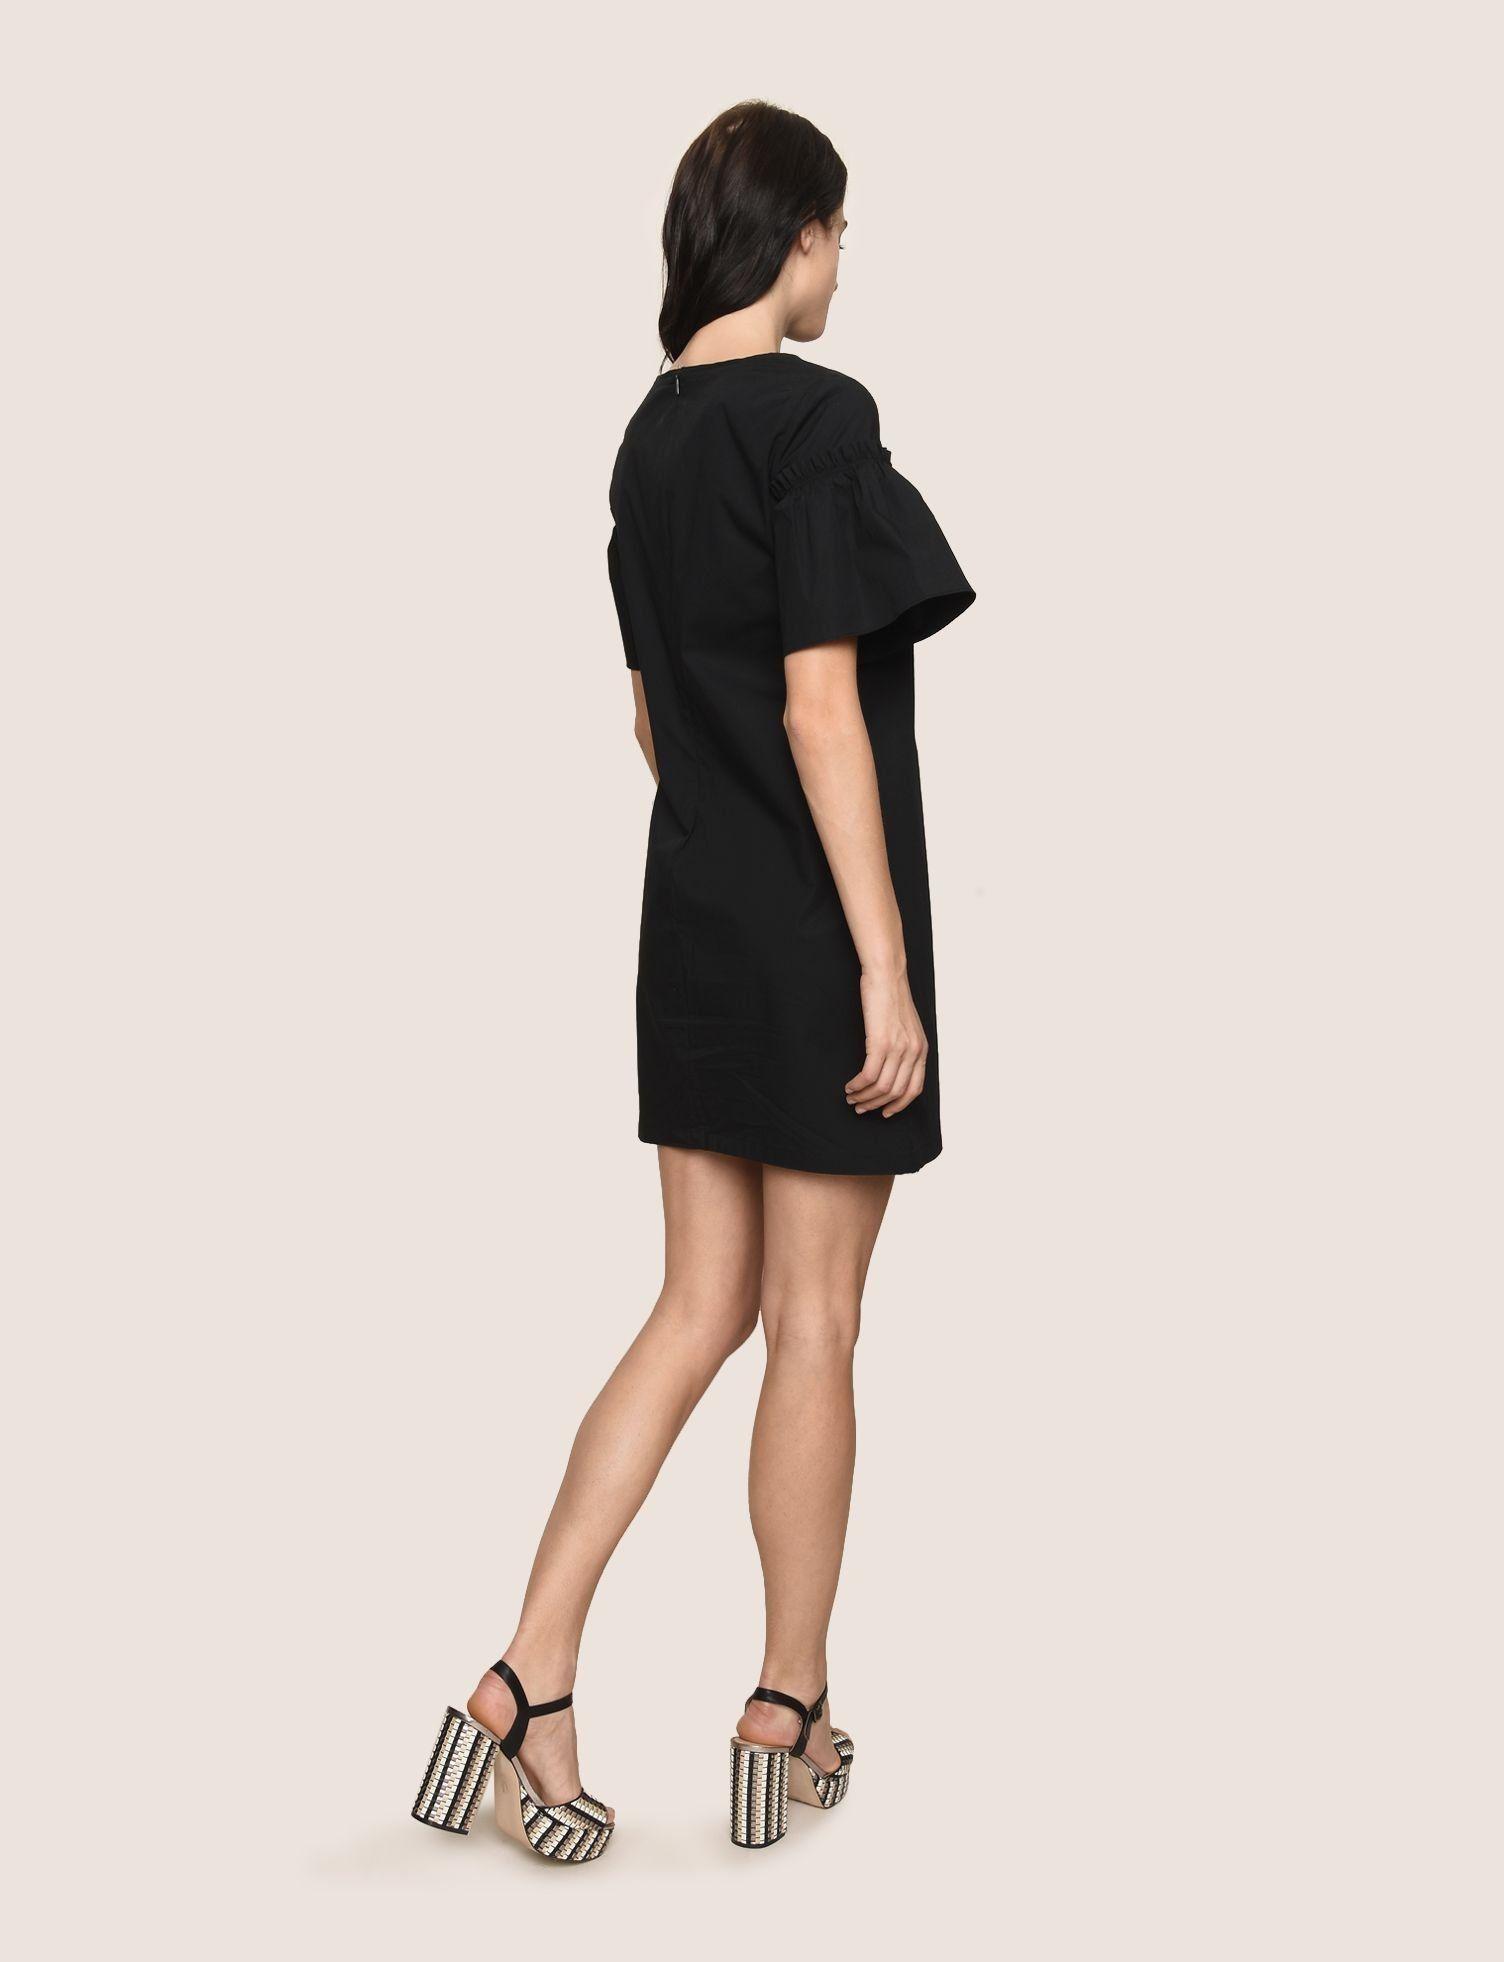 Ax Armani Exchange Womens Structured Shoulder Dress Black 4 Click Image For More Details Affiliate Link Dresses Dresses Black Dress Shoulder Dress [ 1962 x 1504 Pixel ]